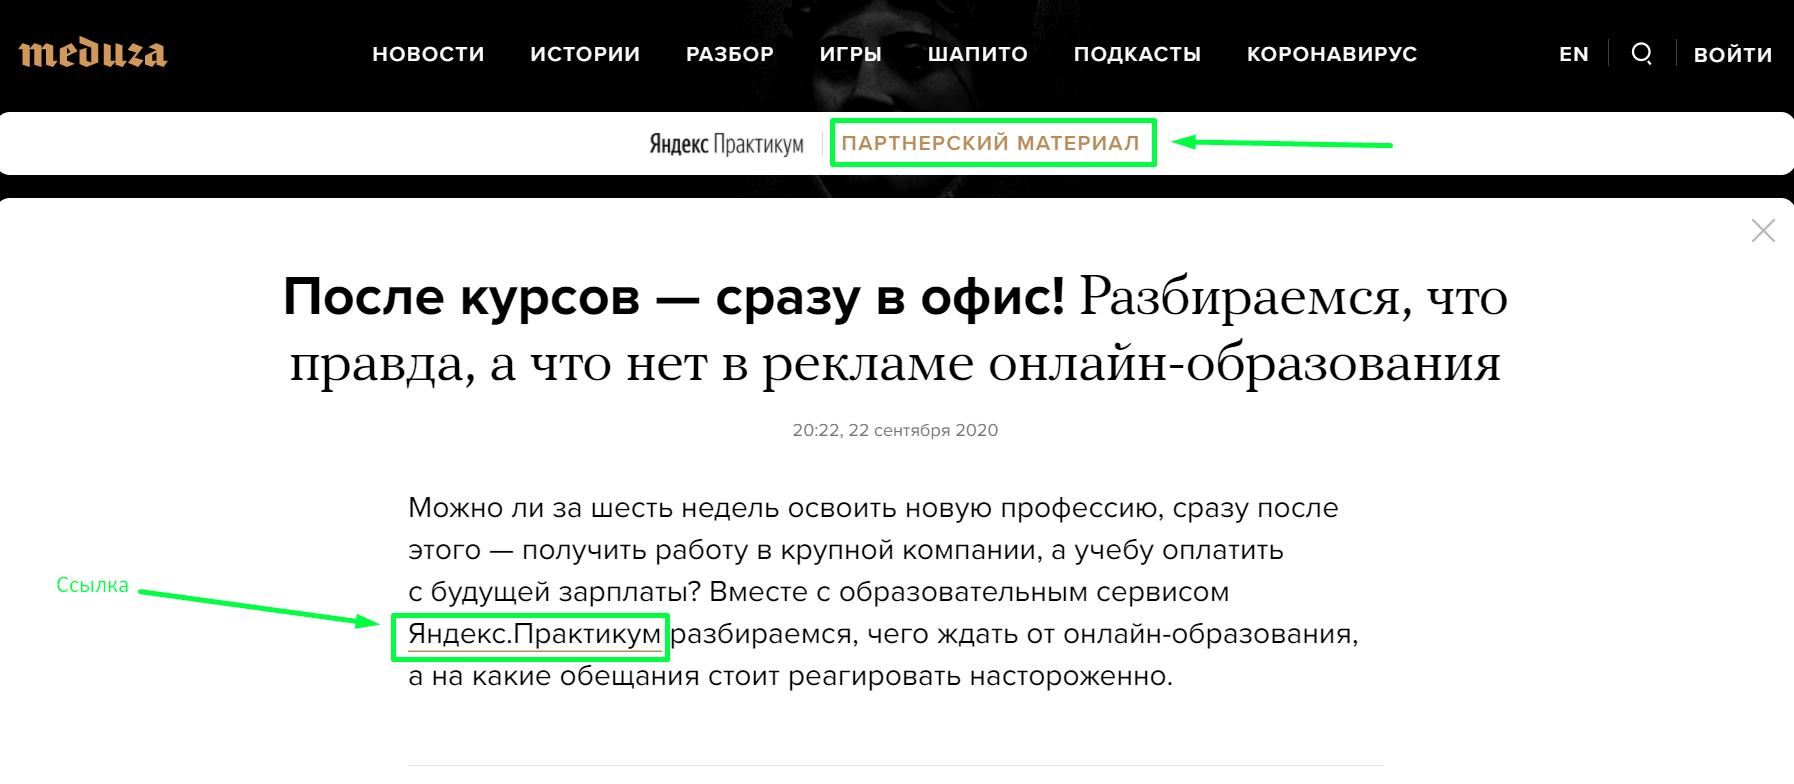 Интернет-трафик на сайт за счет ссылок со статей на тематических ресурсах